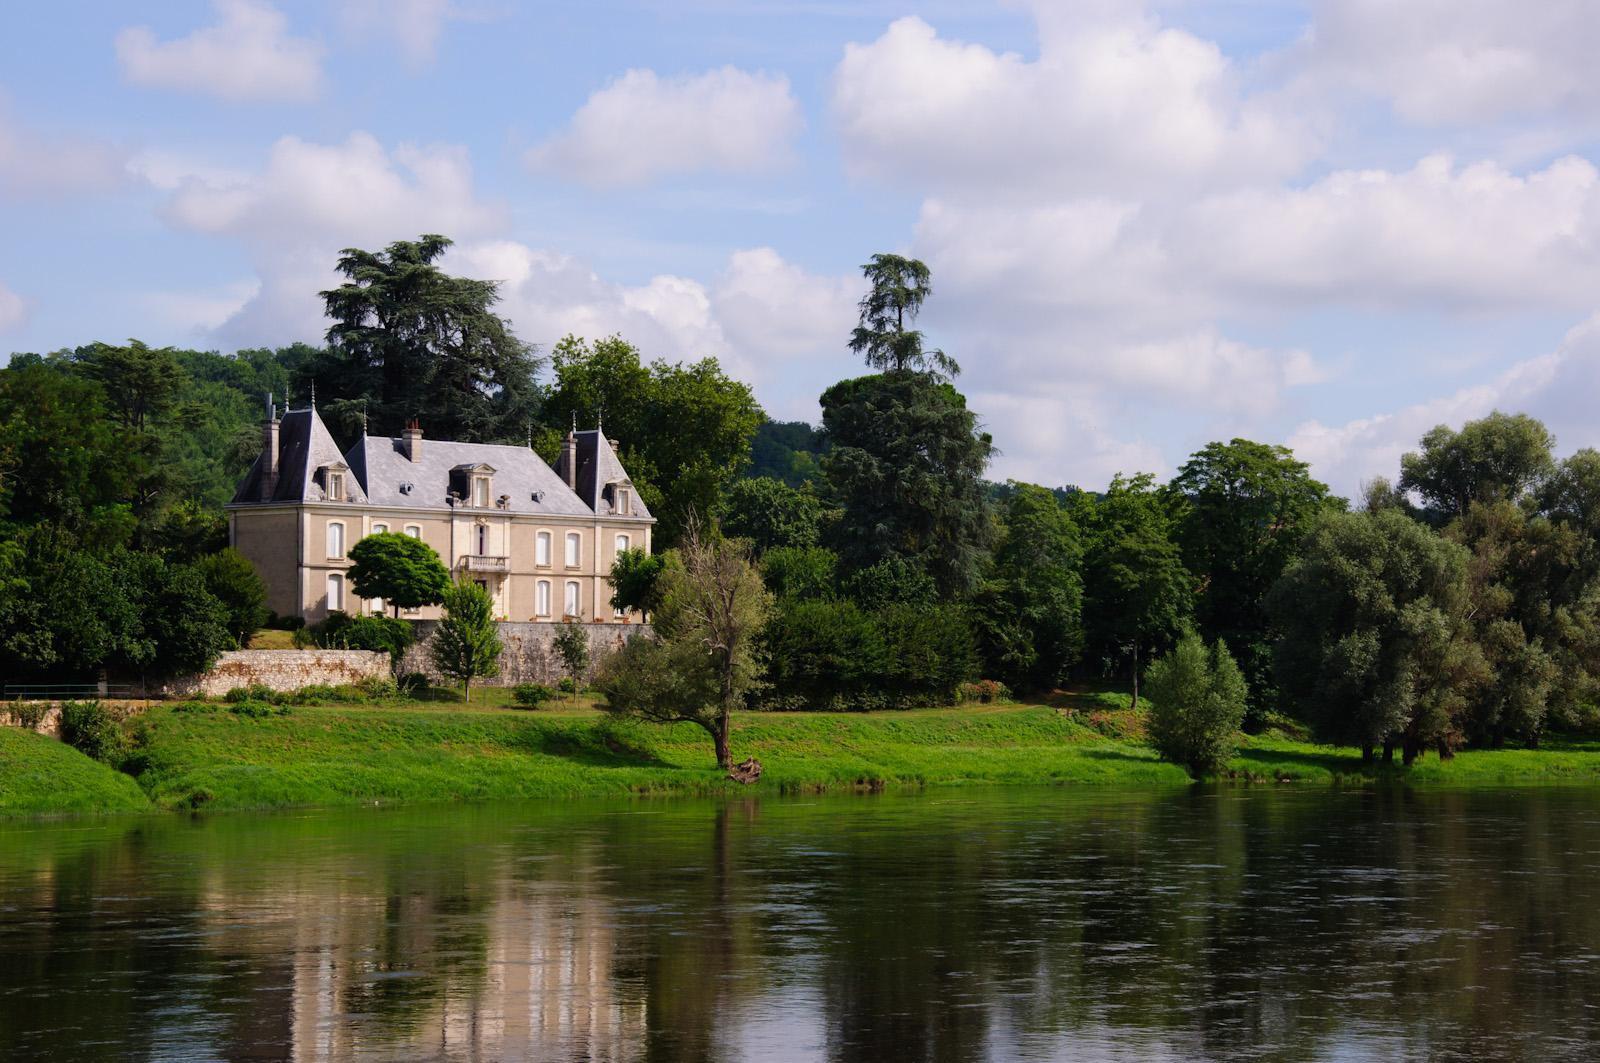 Image : Office de Tourisme** de Sainte-Foy-la-grande